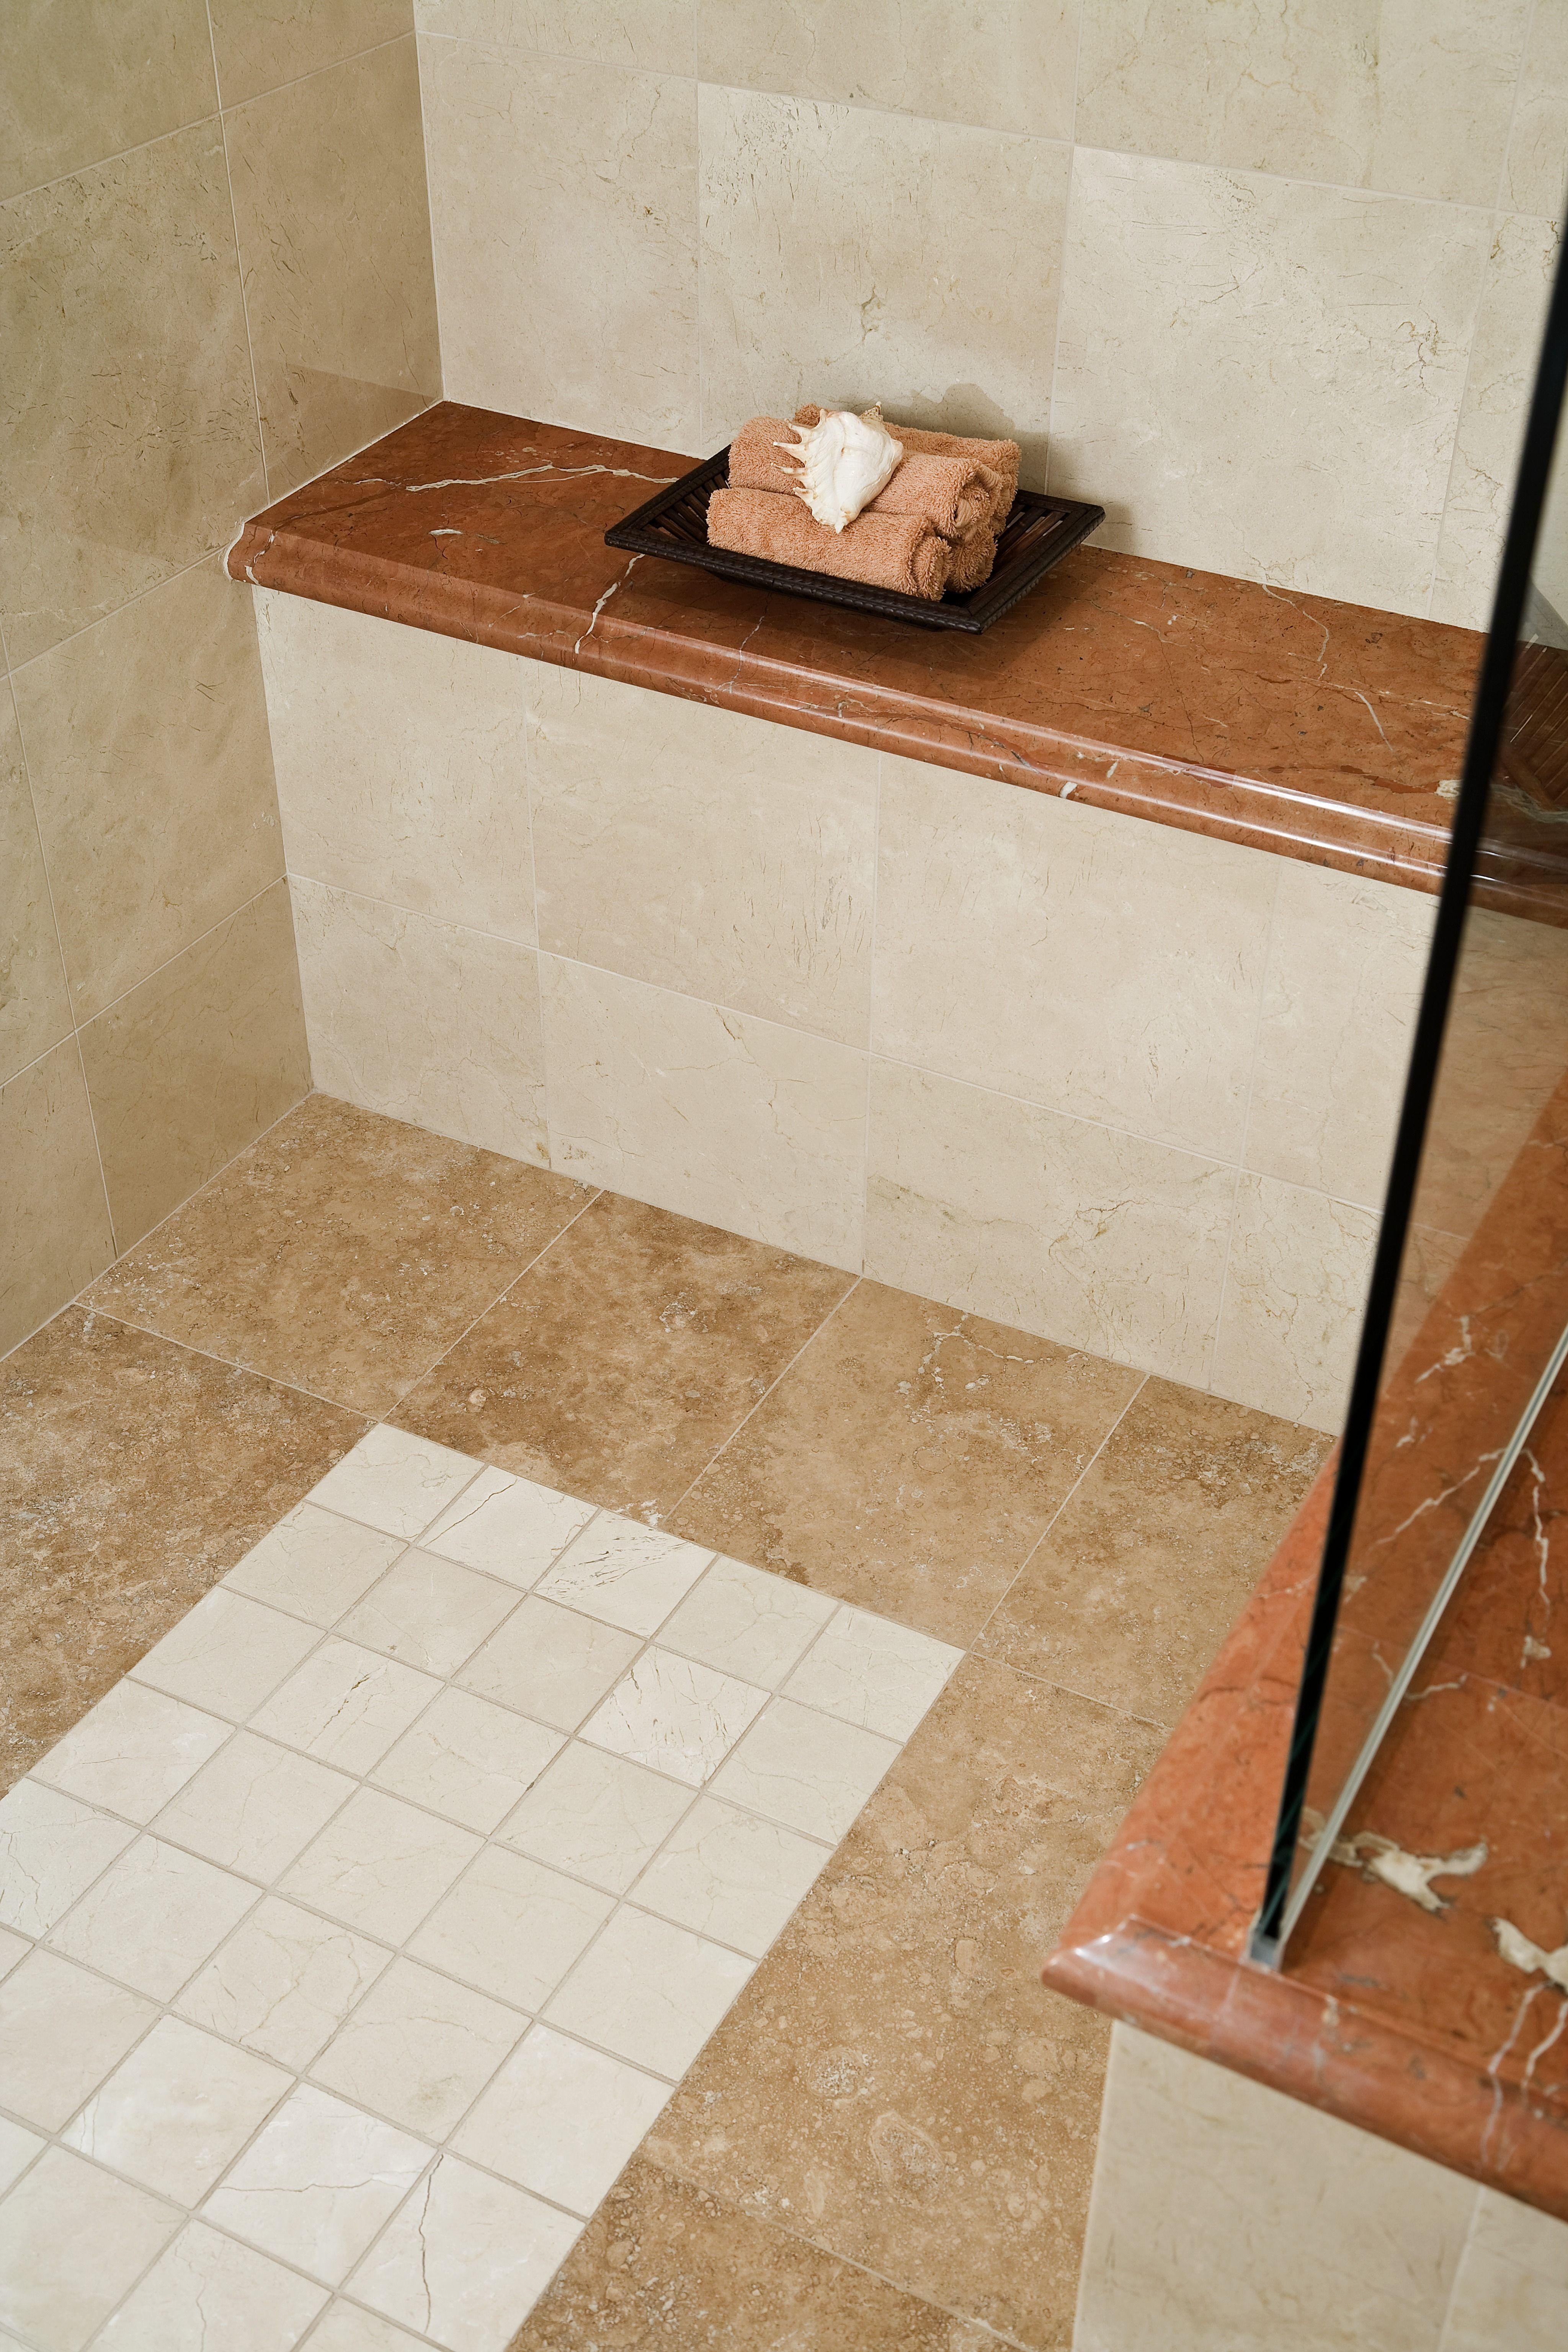 Types of Floor Tiles Cleaning tile floors, Tile floor